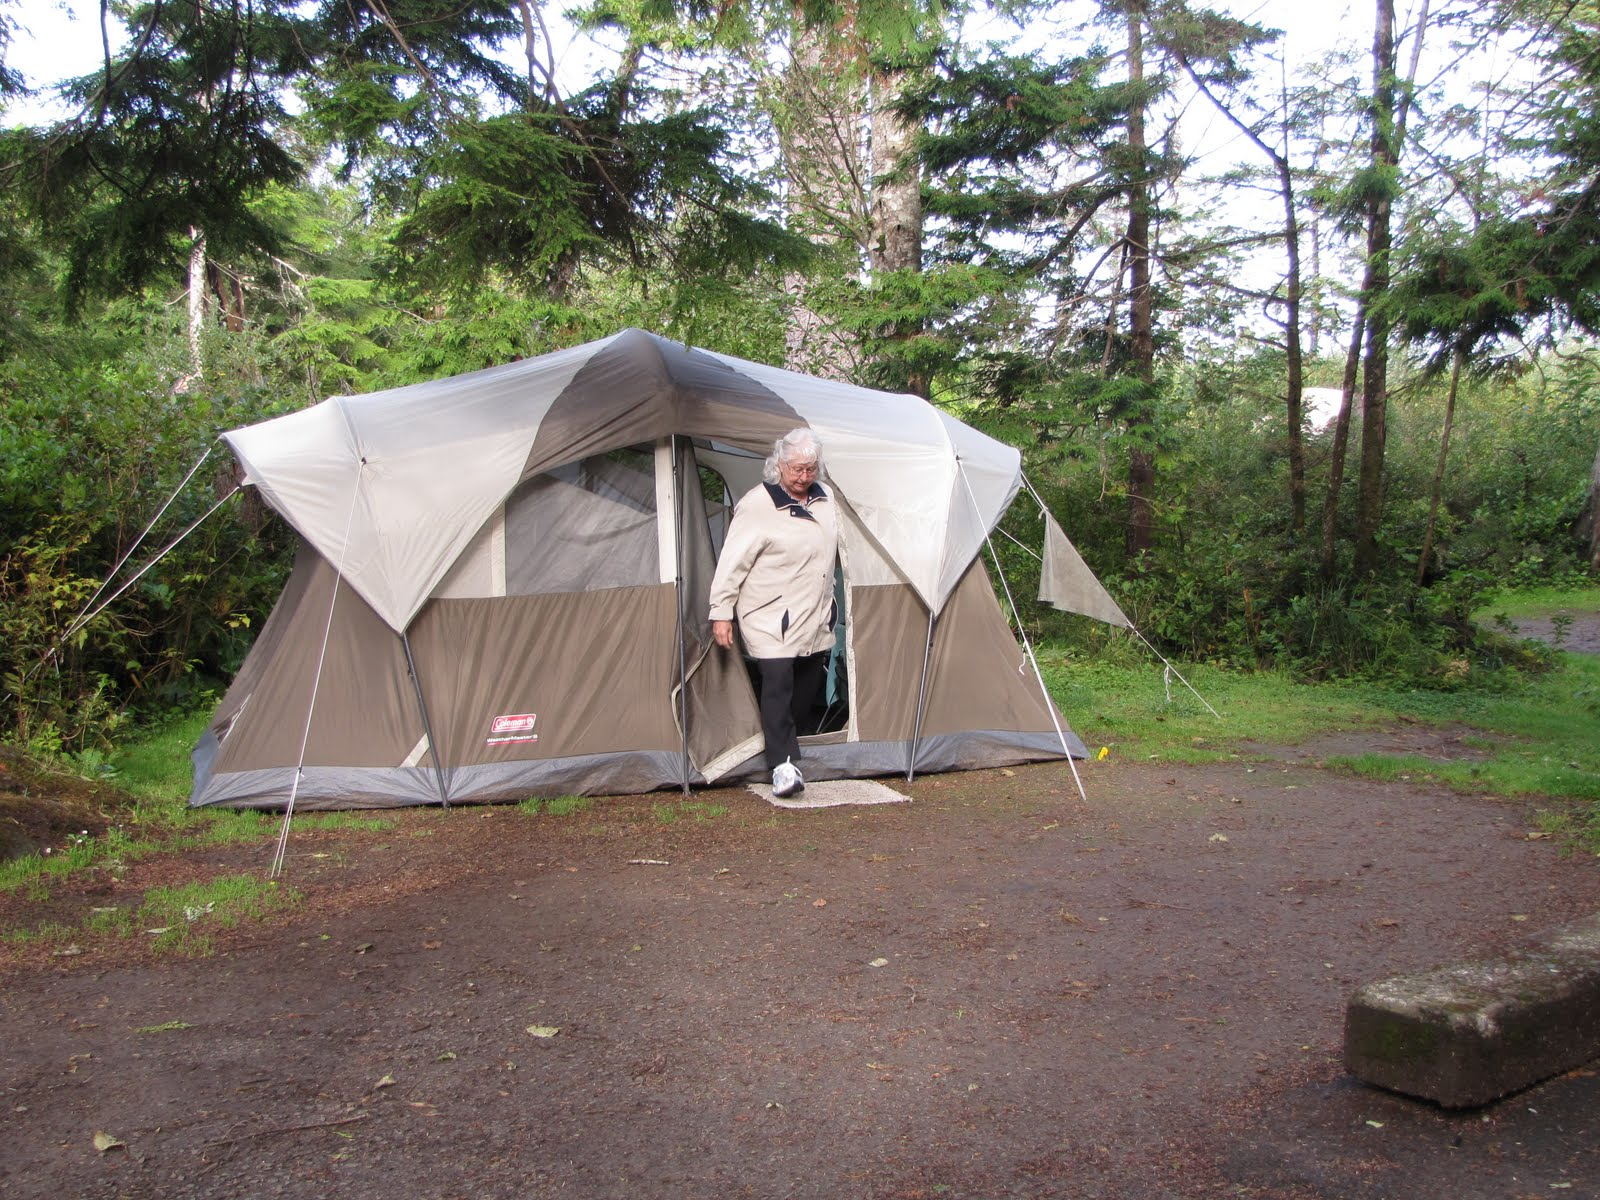 Linda's Ladle: Tent camping on the Oregon Coast #8